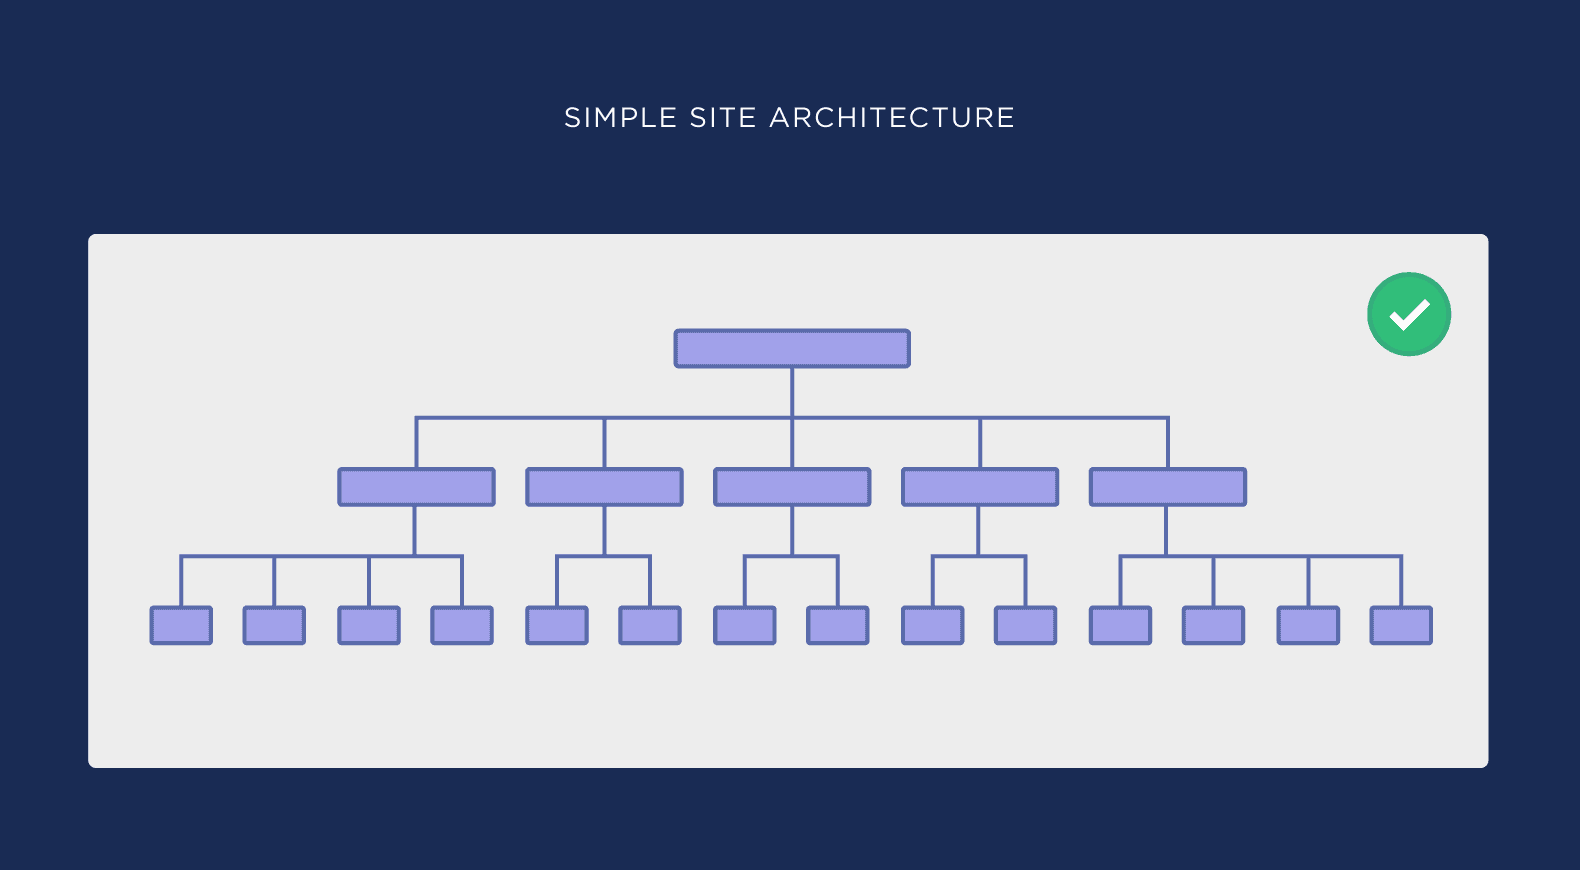 Simple site architecture